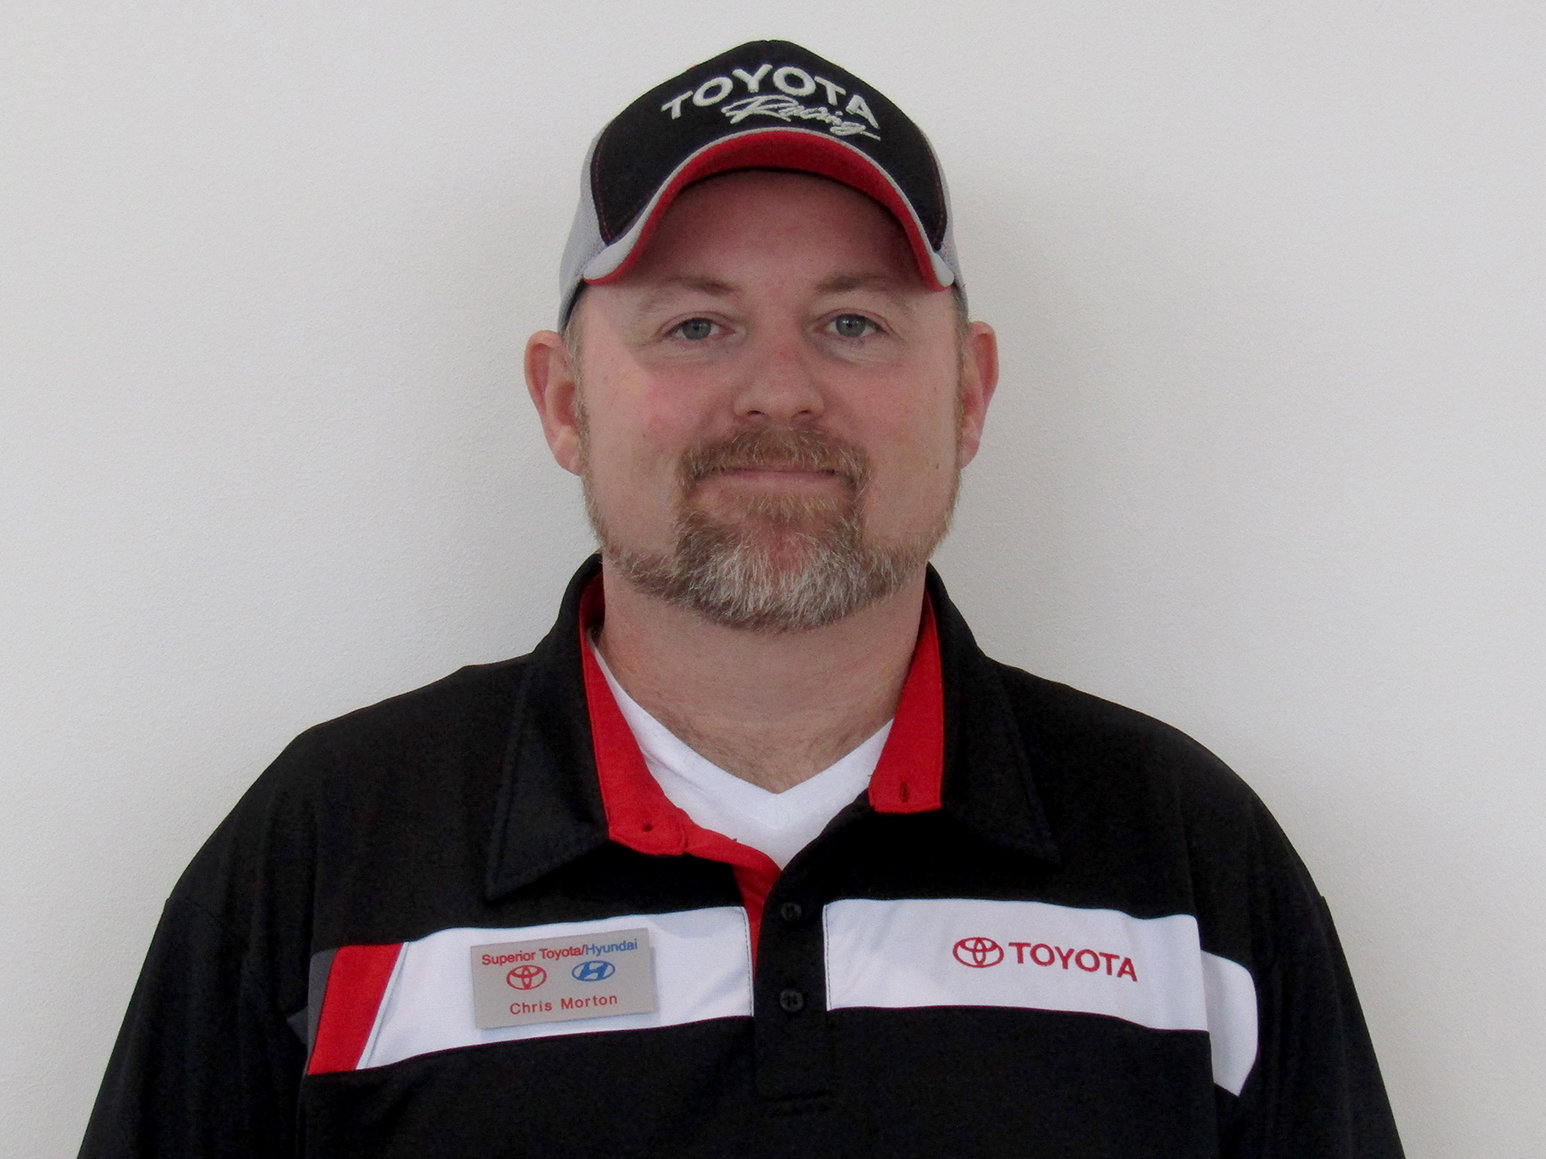 Chris Morton - Service Manager